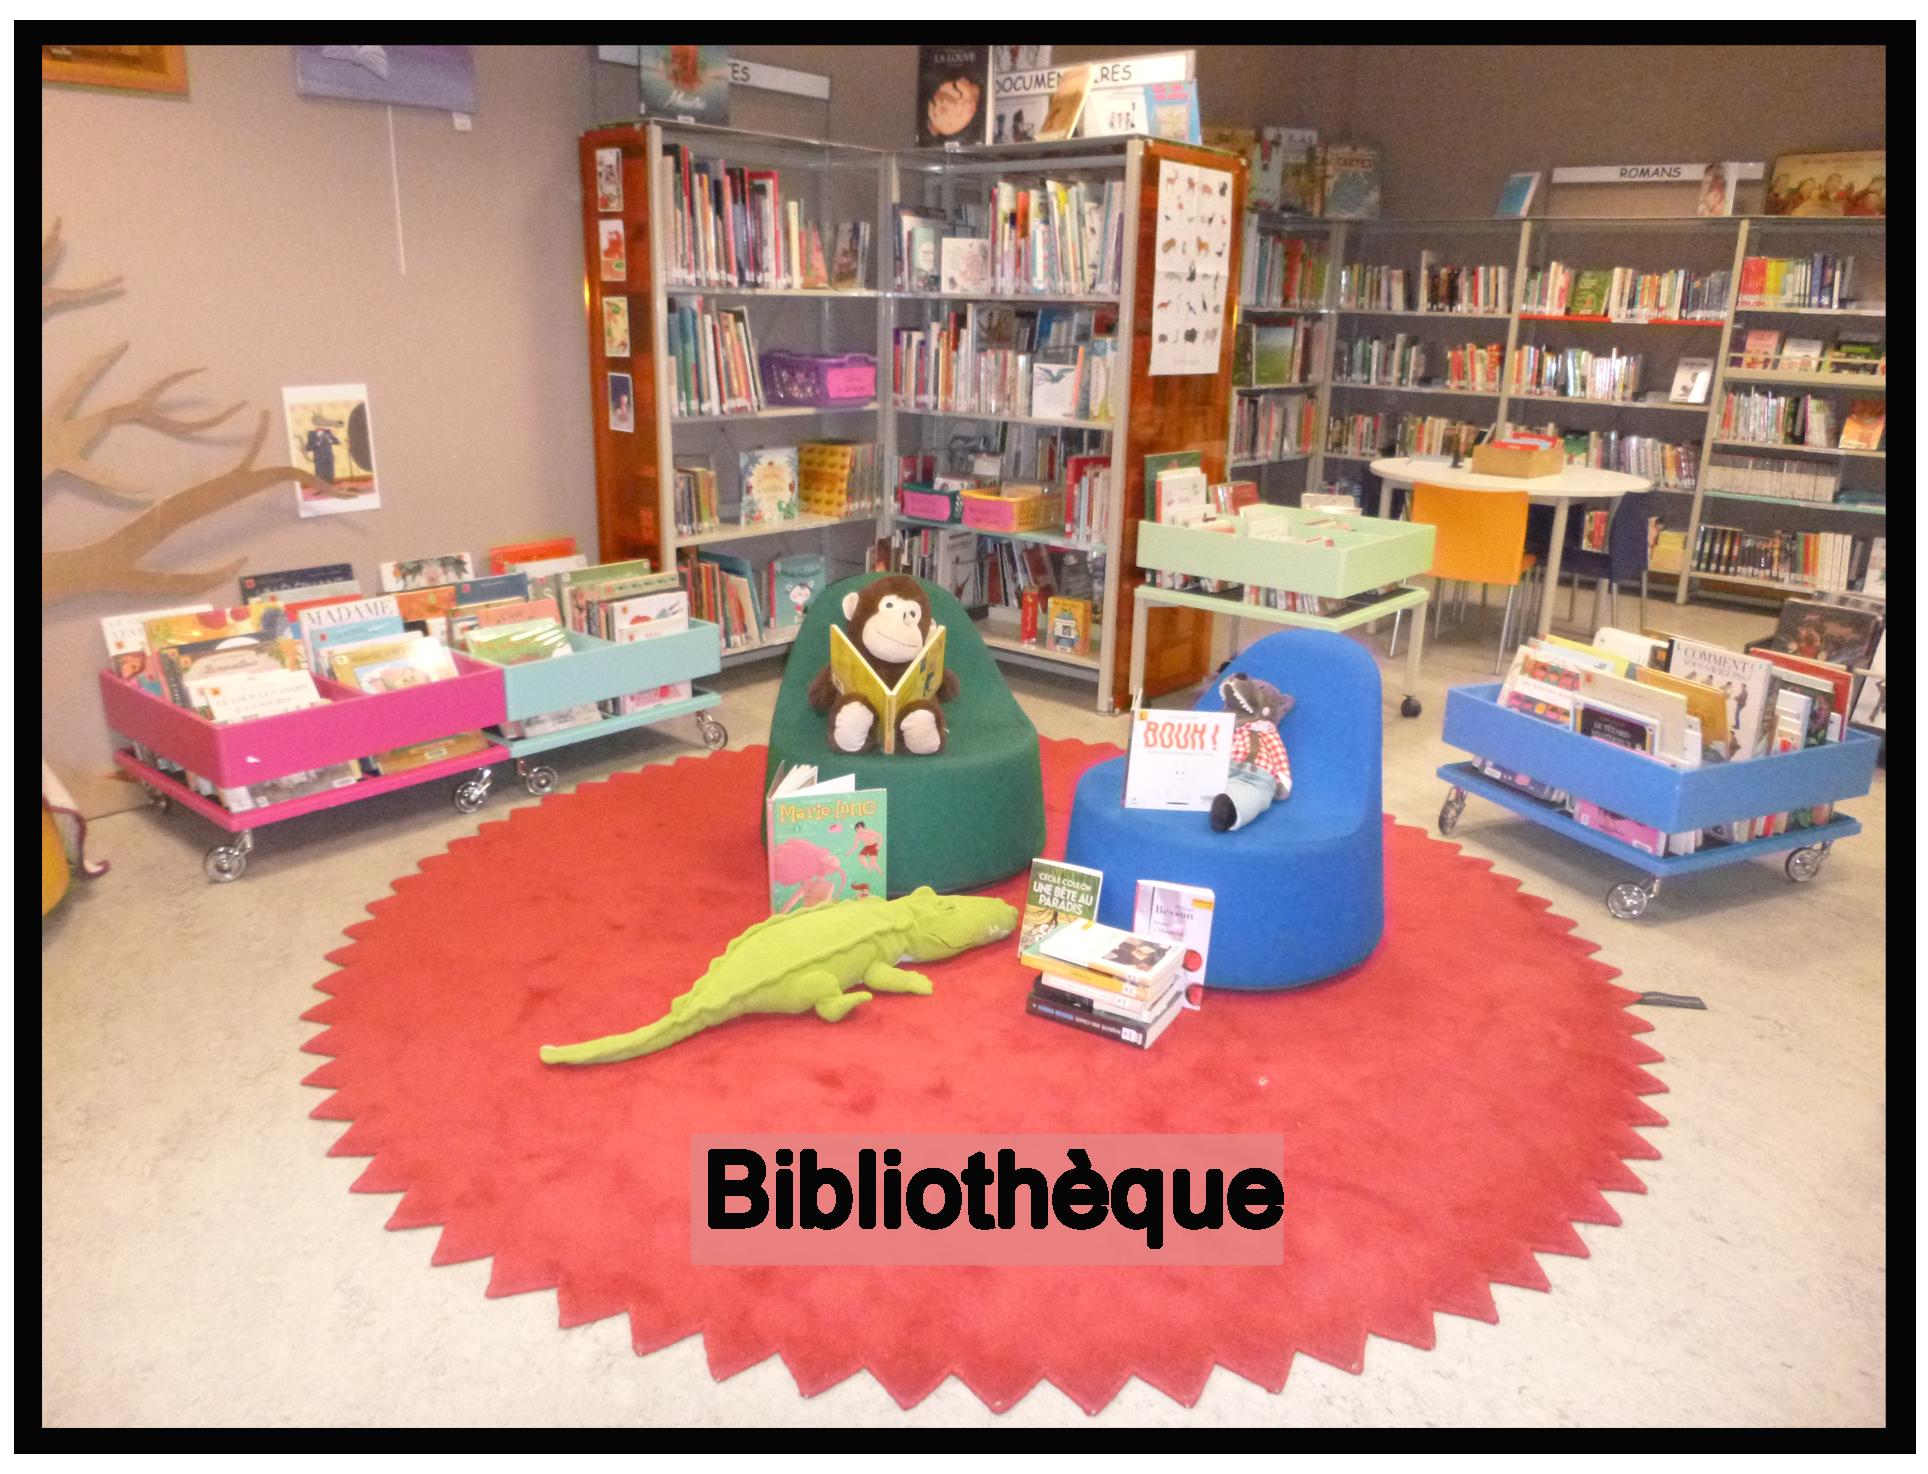 bibliothèque bouton2.png